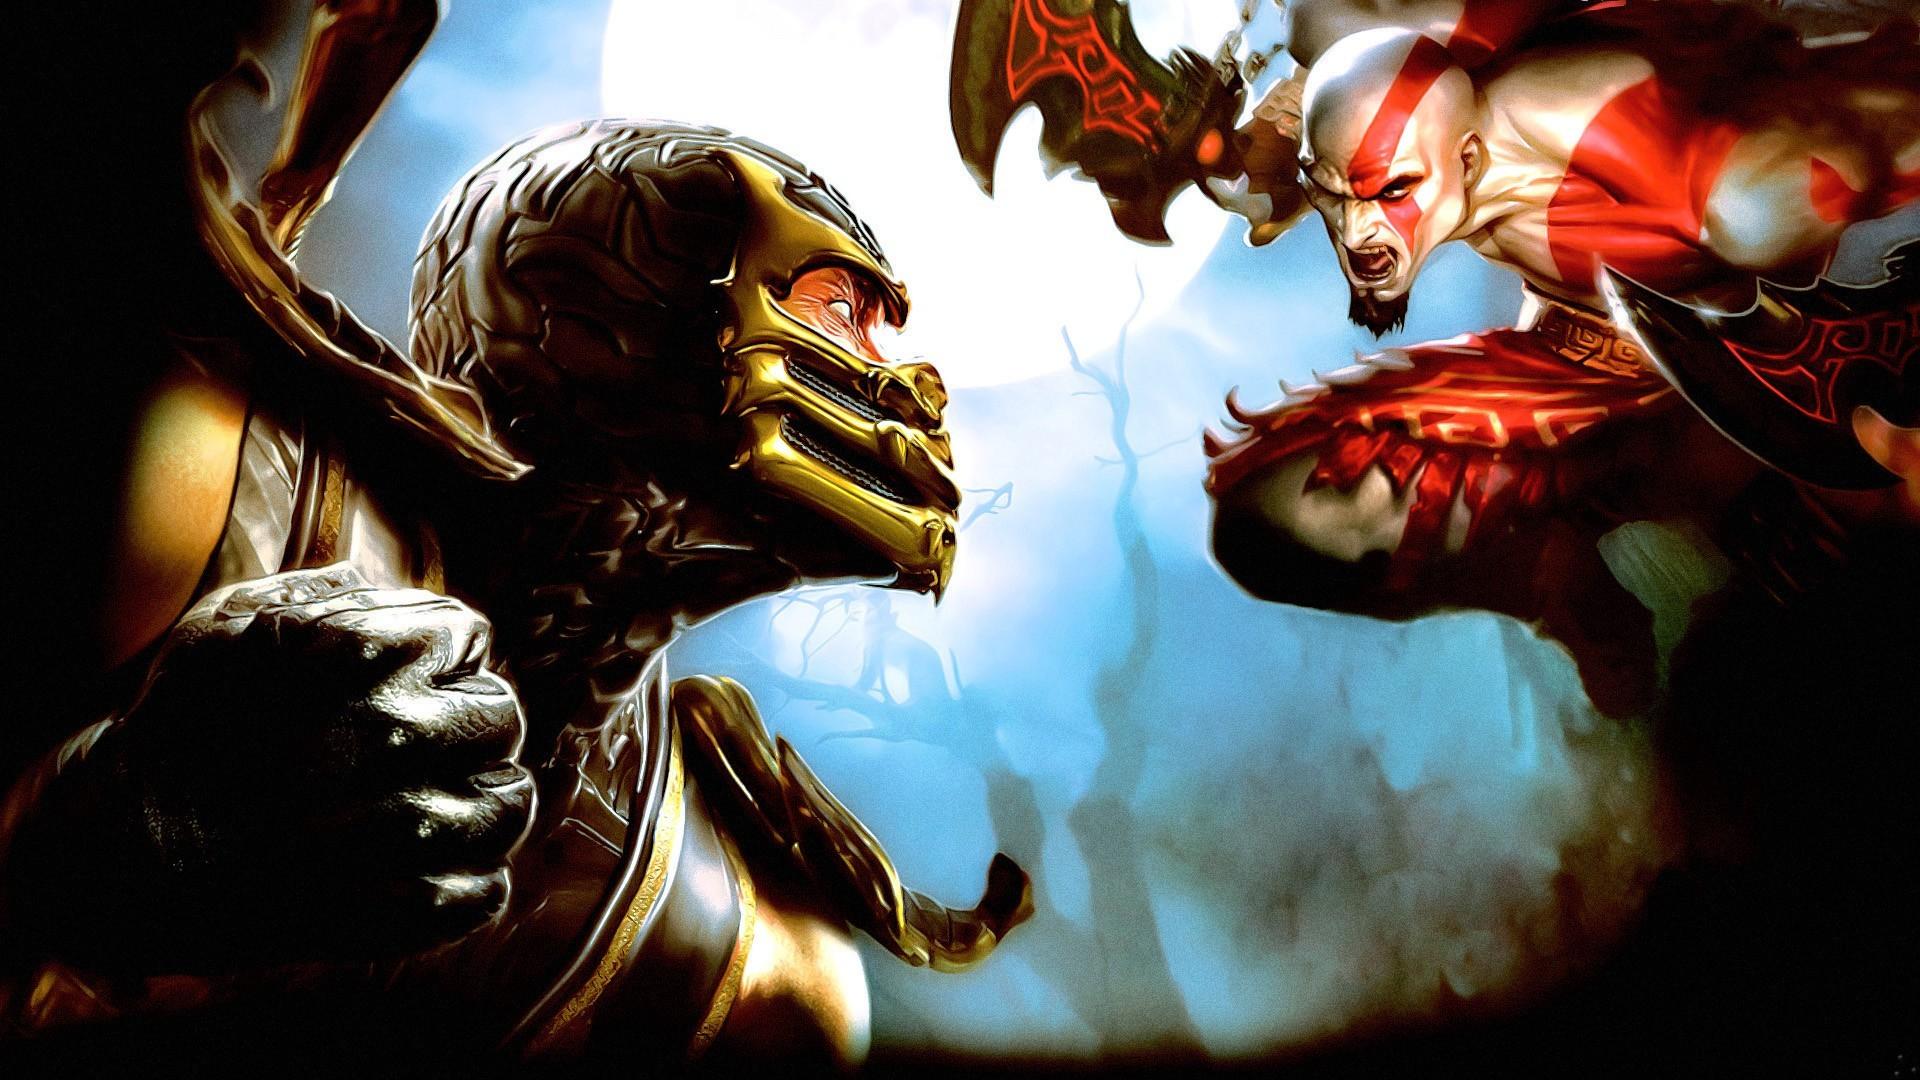 Wallpaper : Mortal Kombat, Scorpion character, mythology, God of War